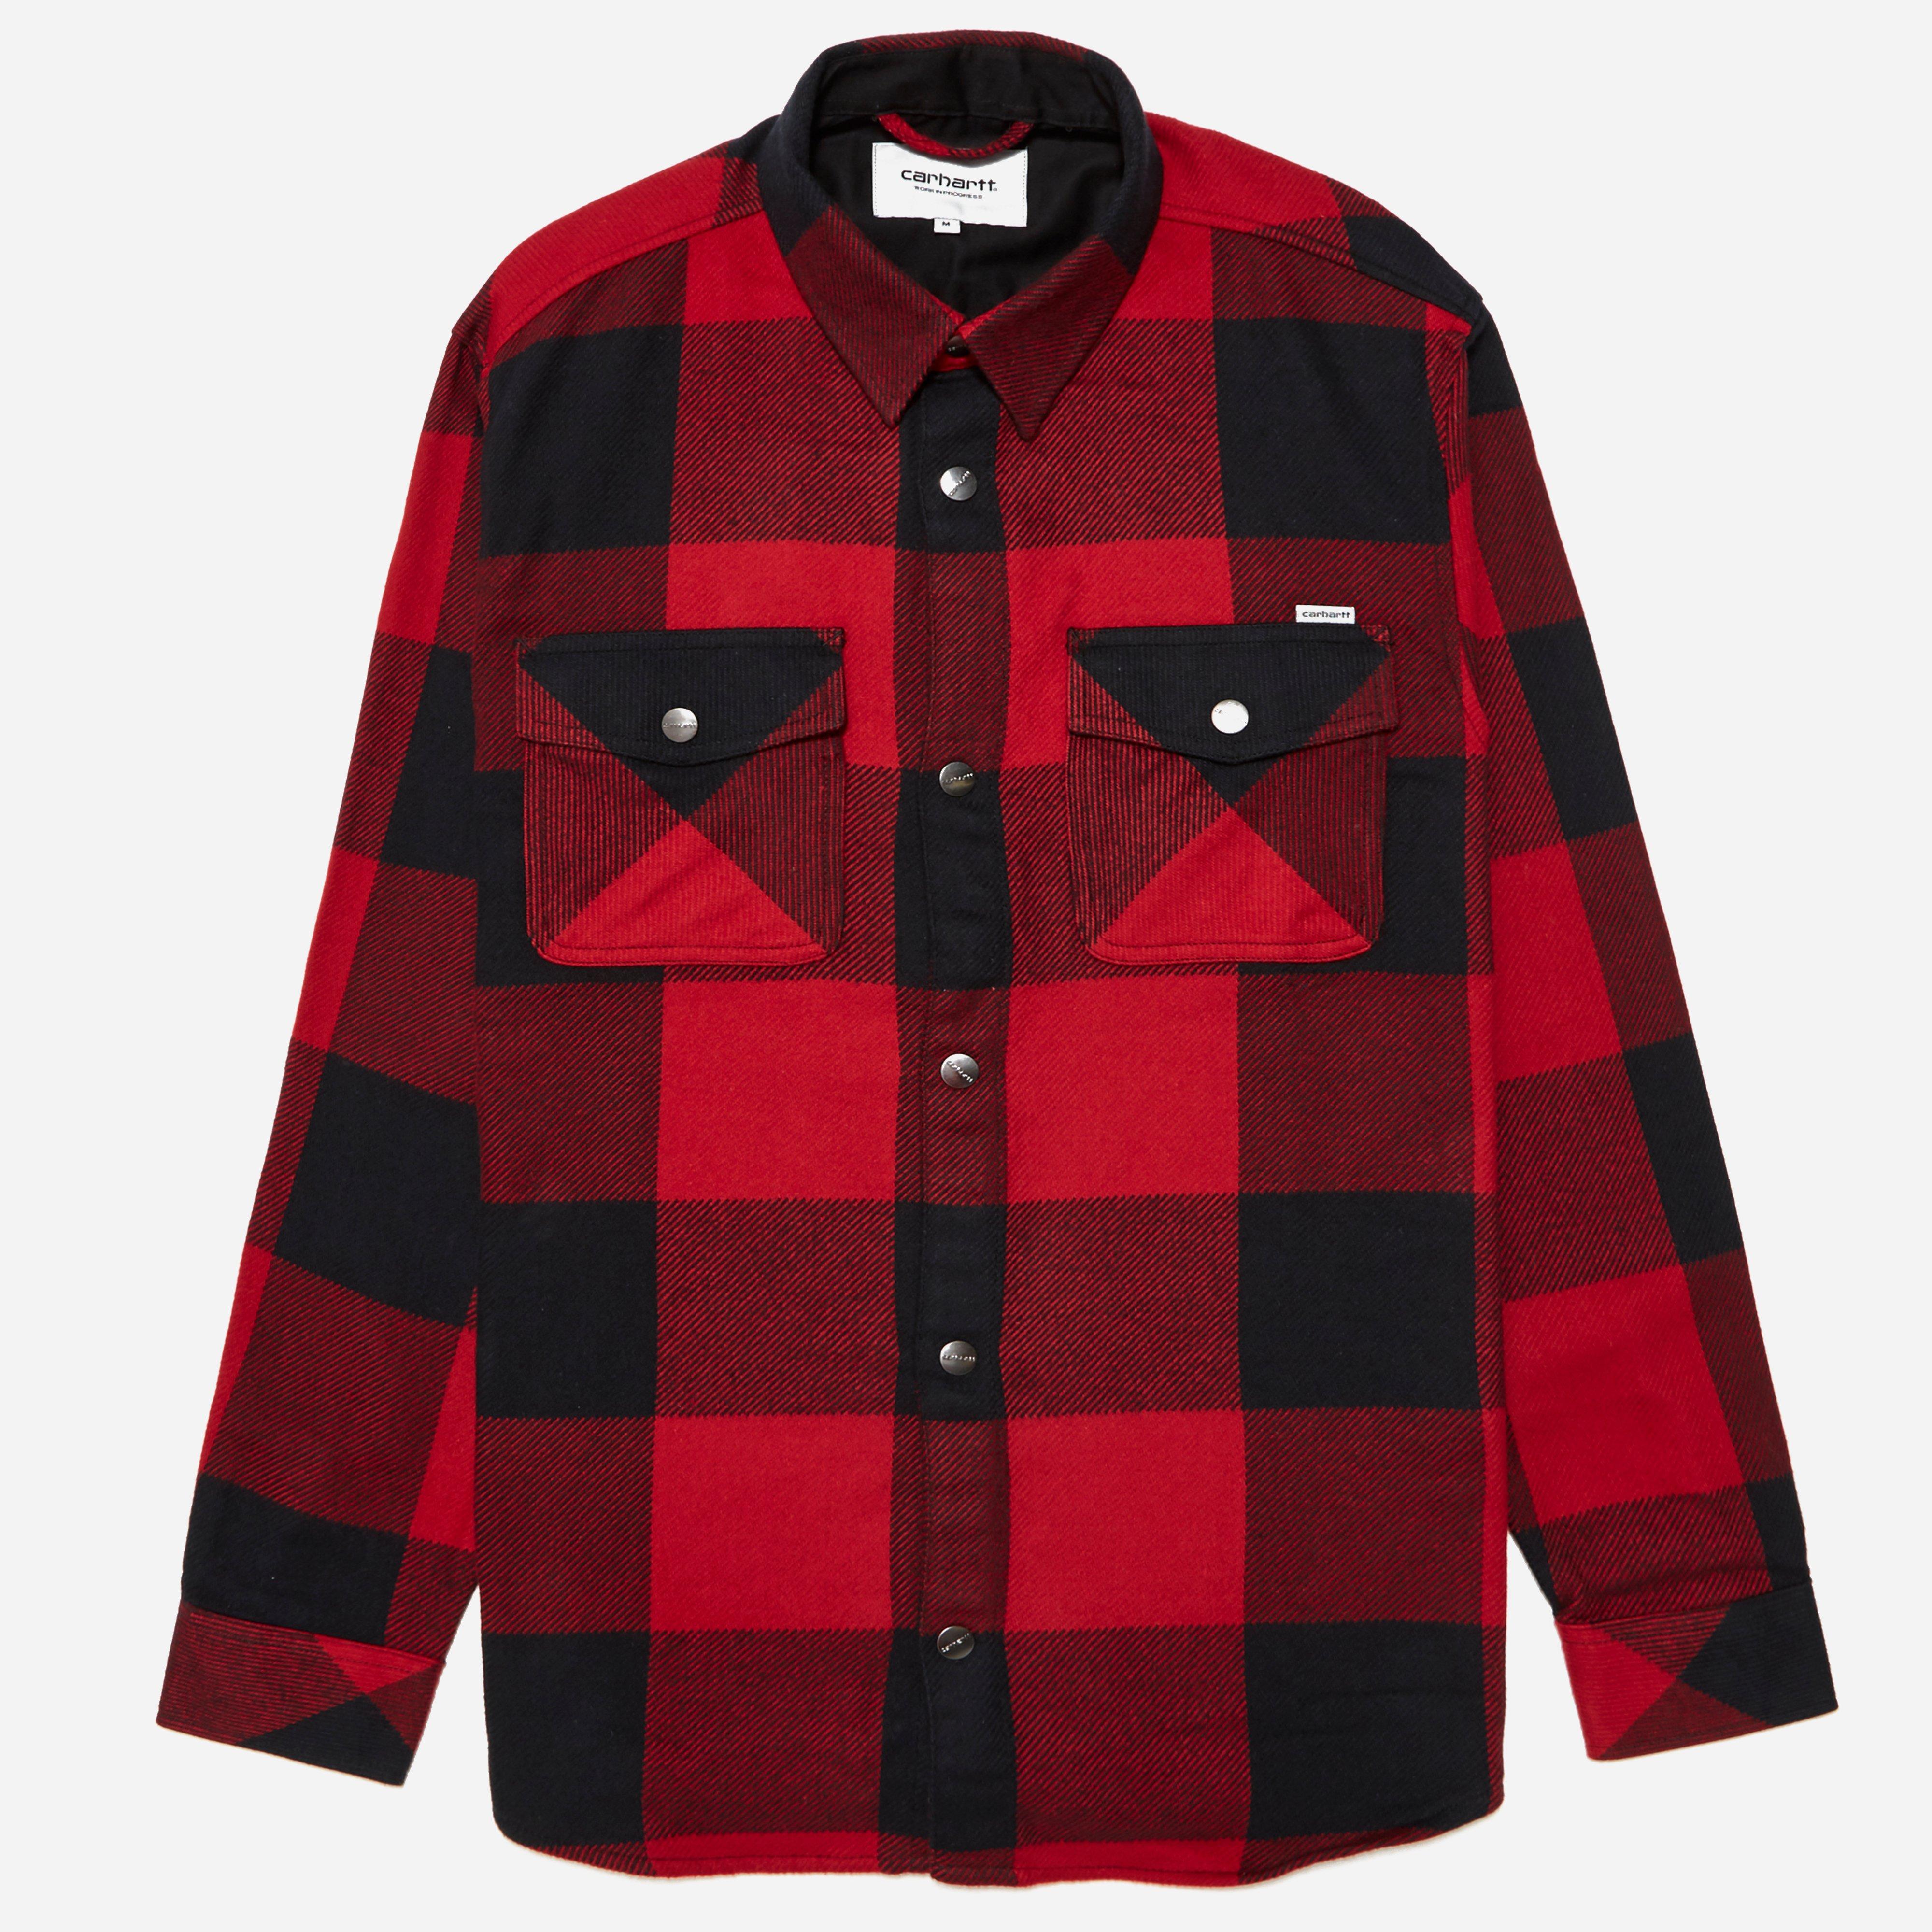 Carhartt WIP Graham Check Shirt